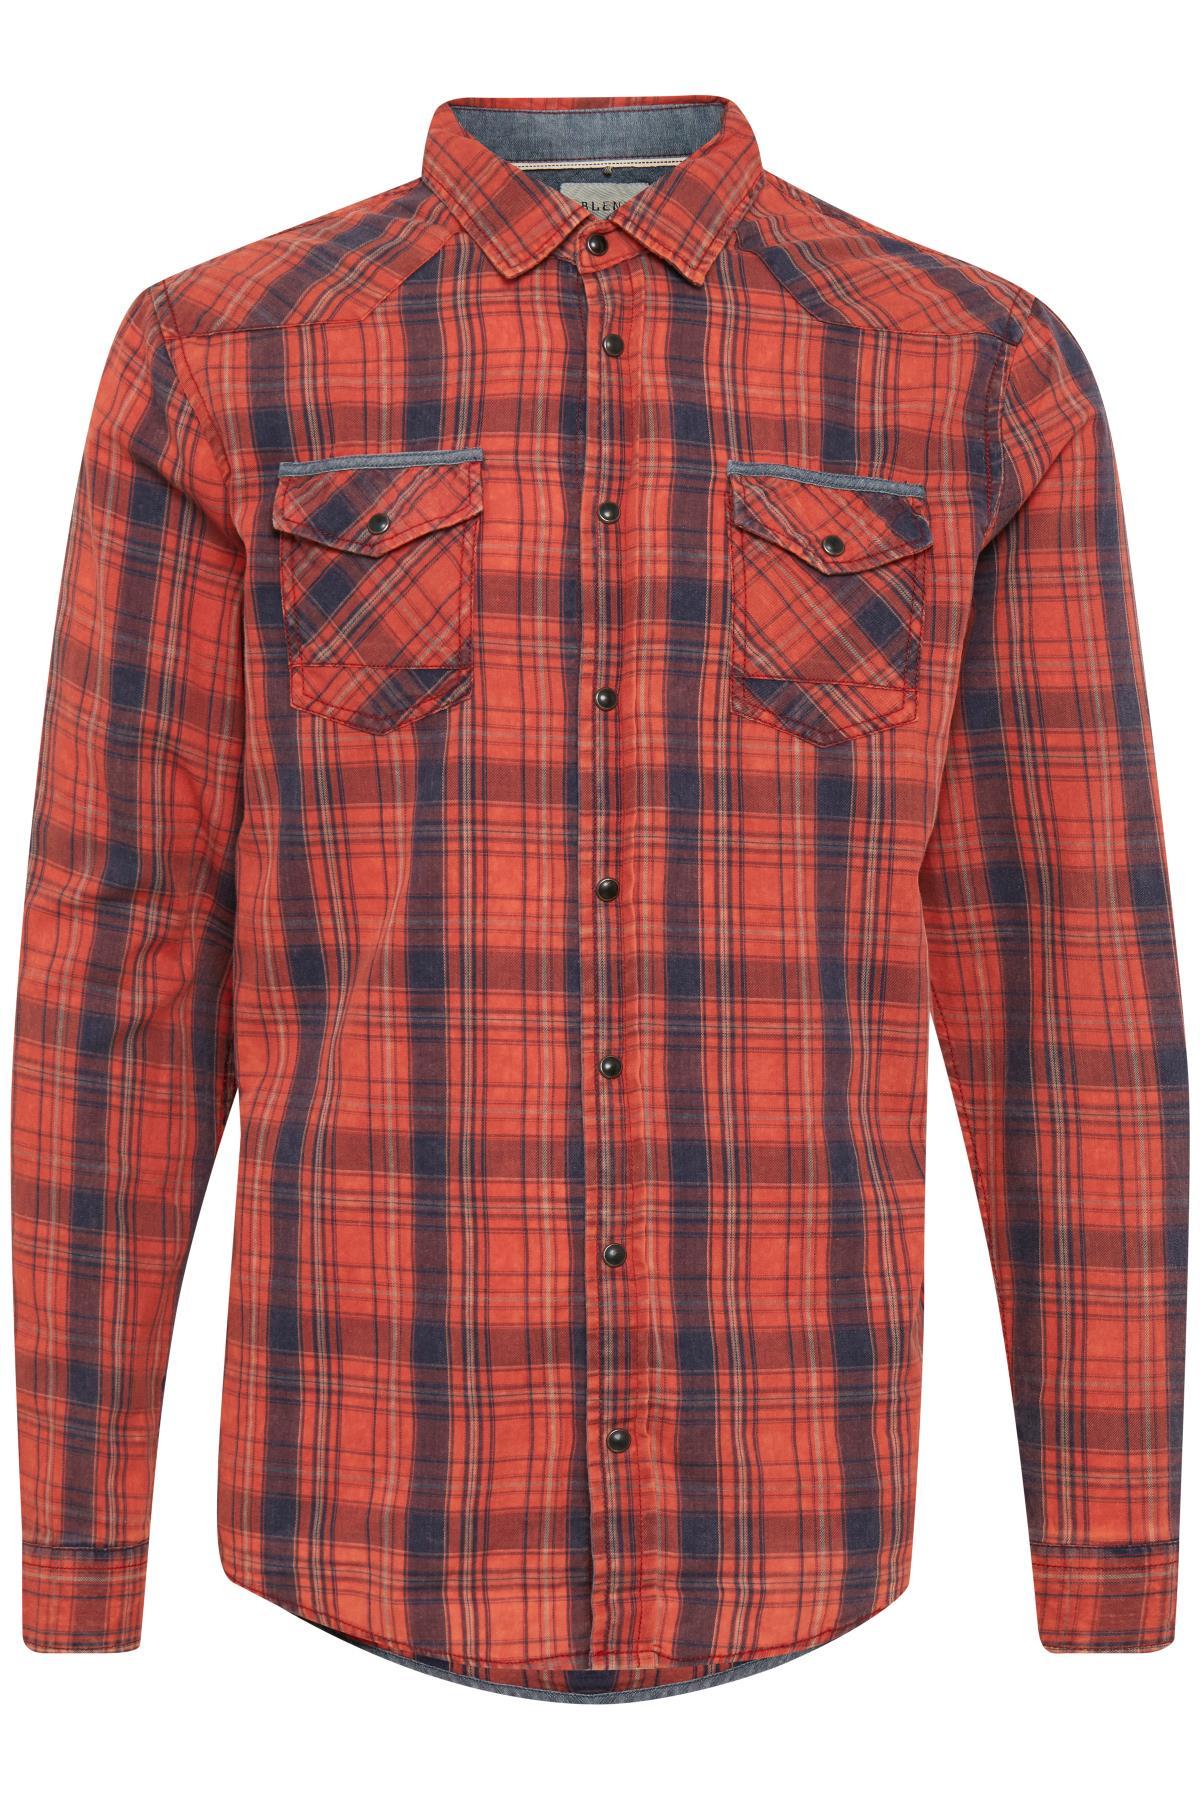 Tandori Red Long sleeved shirt fra Blend He – Køb Tandori Red Long sleeved shirt fra str. S-XXL her